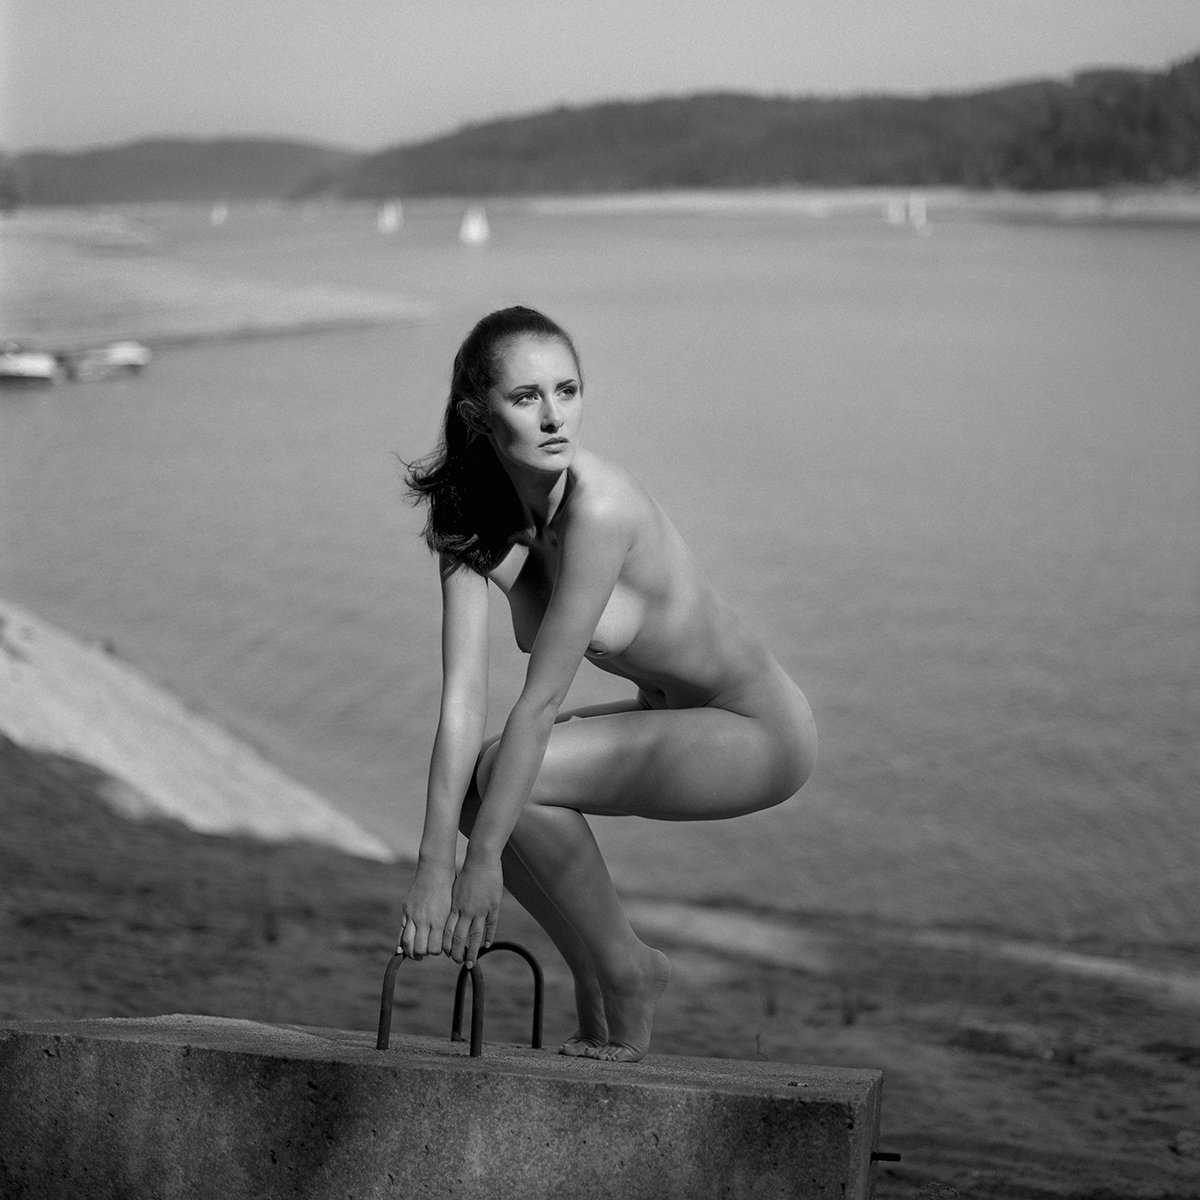 akt, nude, analog, hasselblad, ninoveron, women, topless, fineart, bw, 6x6,, NinoVeron